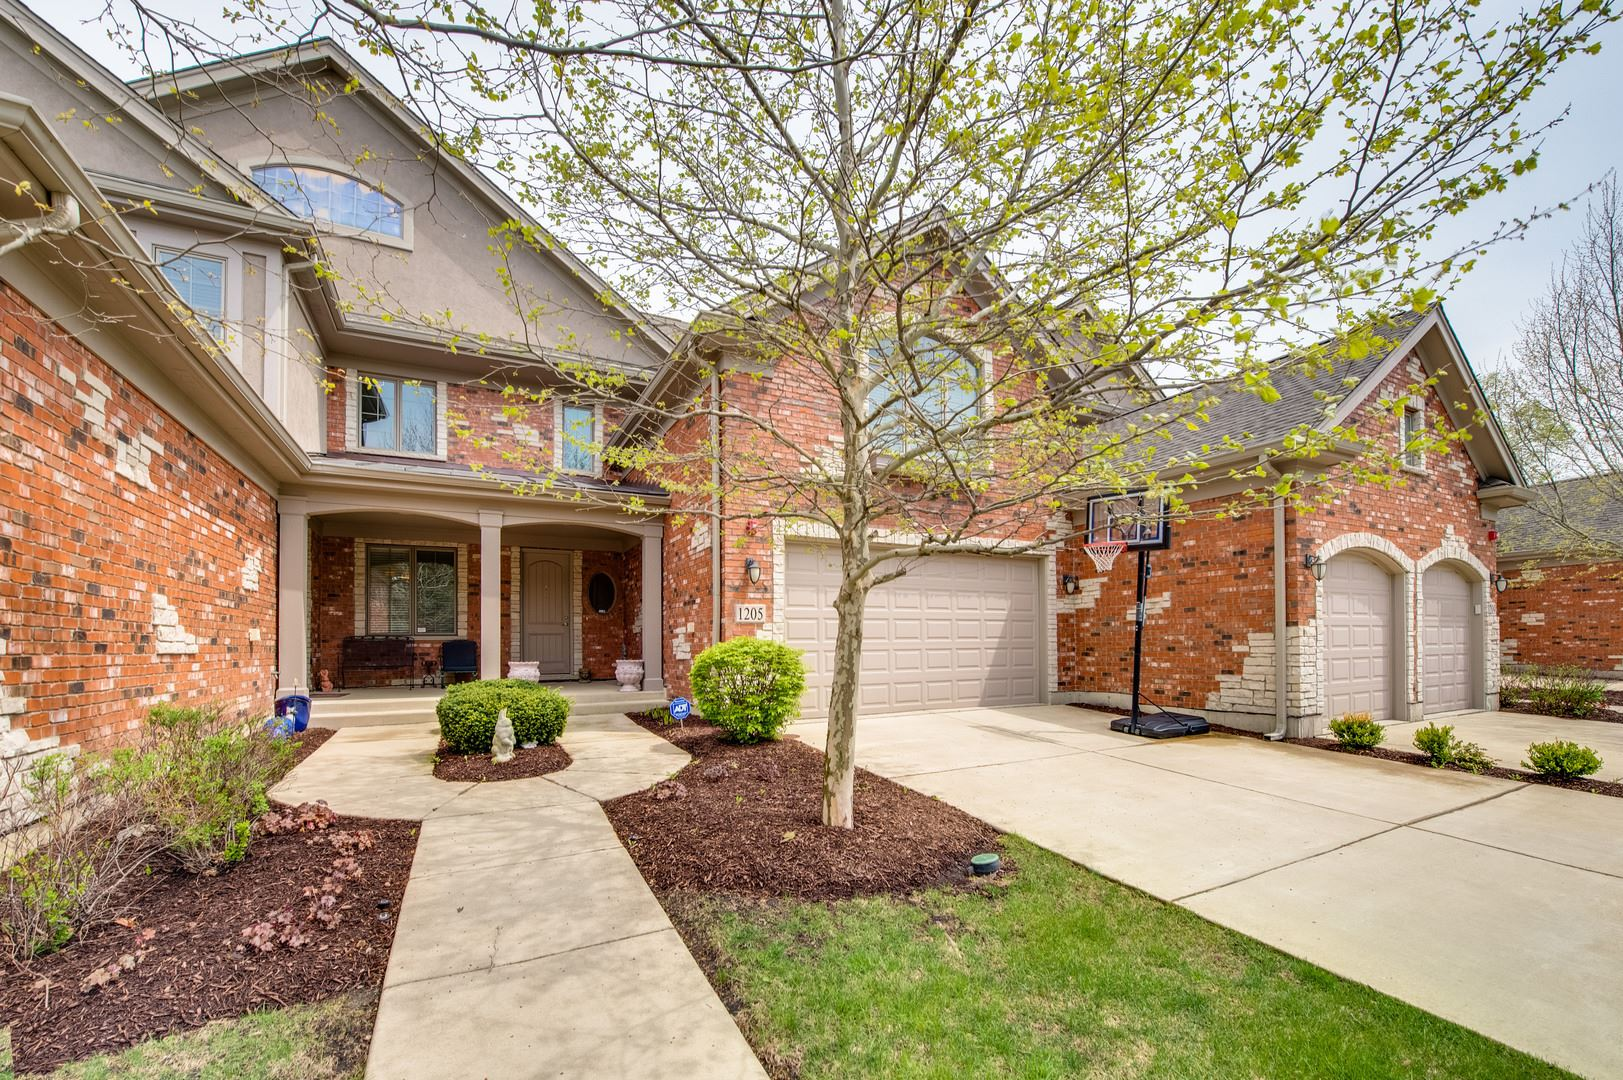 1205 W Charles Lane, Westmont, IL 60559 - #: 10696497